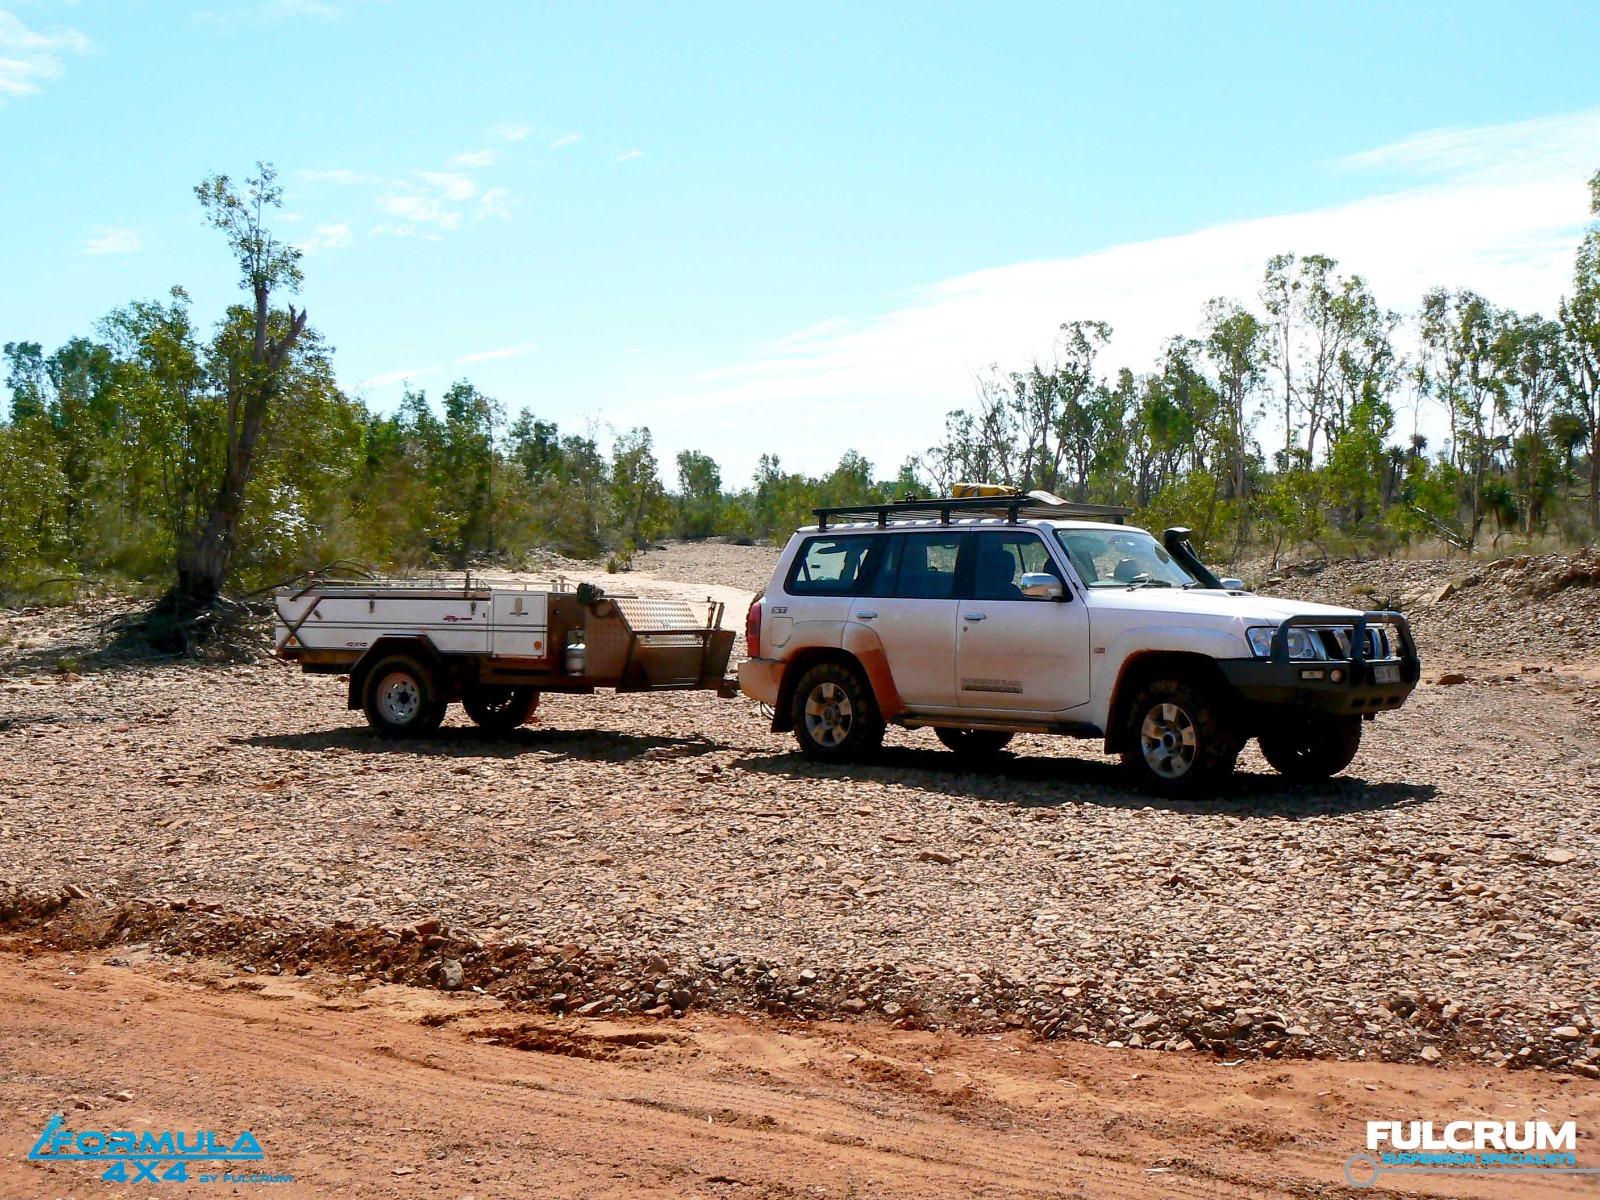 Formula 4x4 Big Bore Customer Review Nissan Patrol Touring Australia